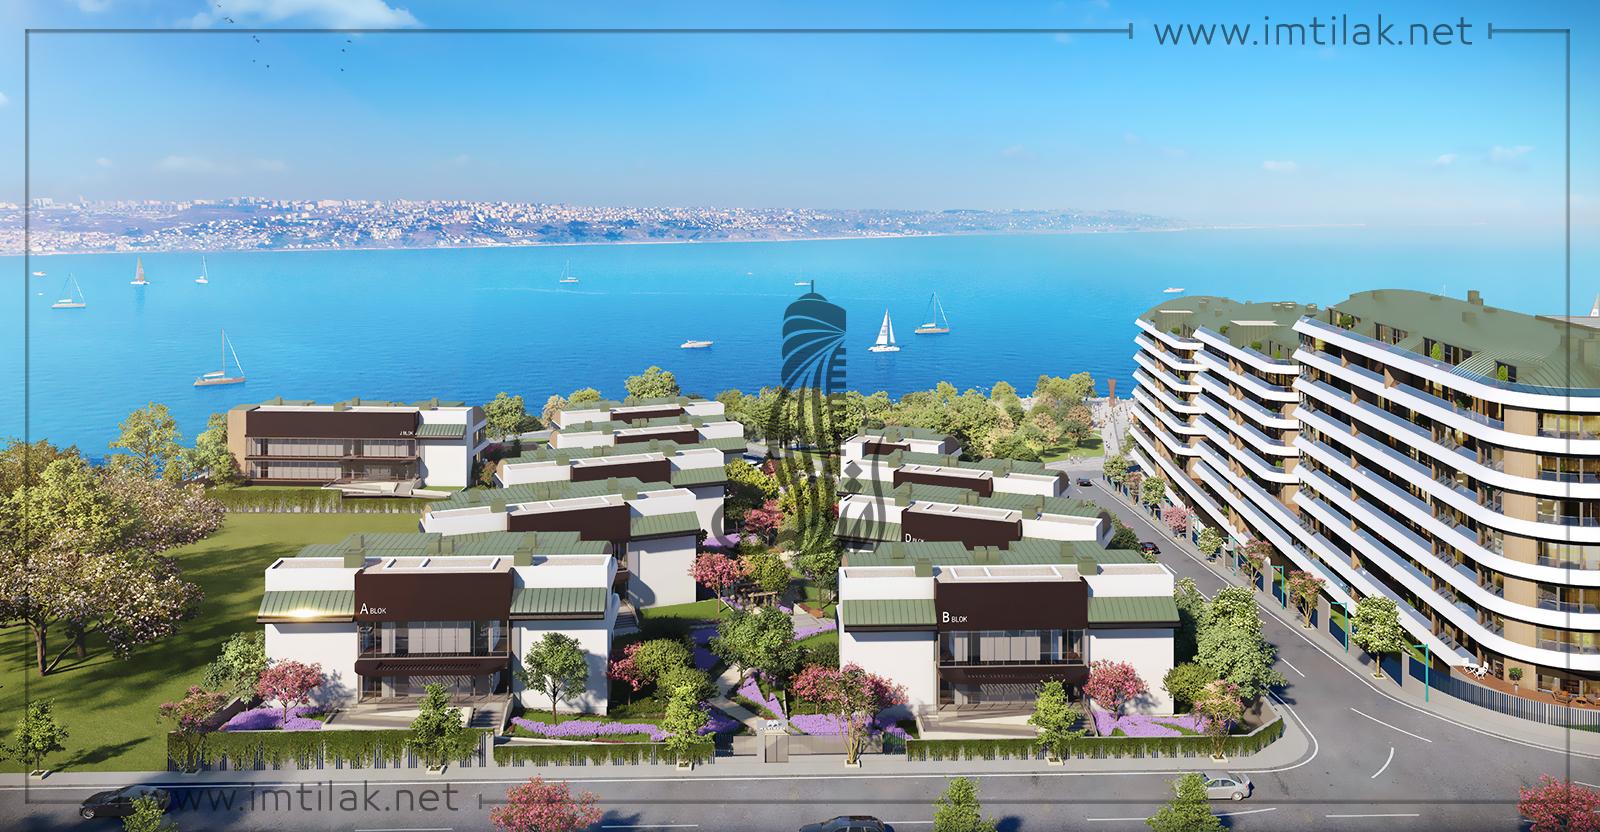 IMT-71 Marina Marmara Sea Project